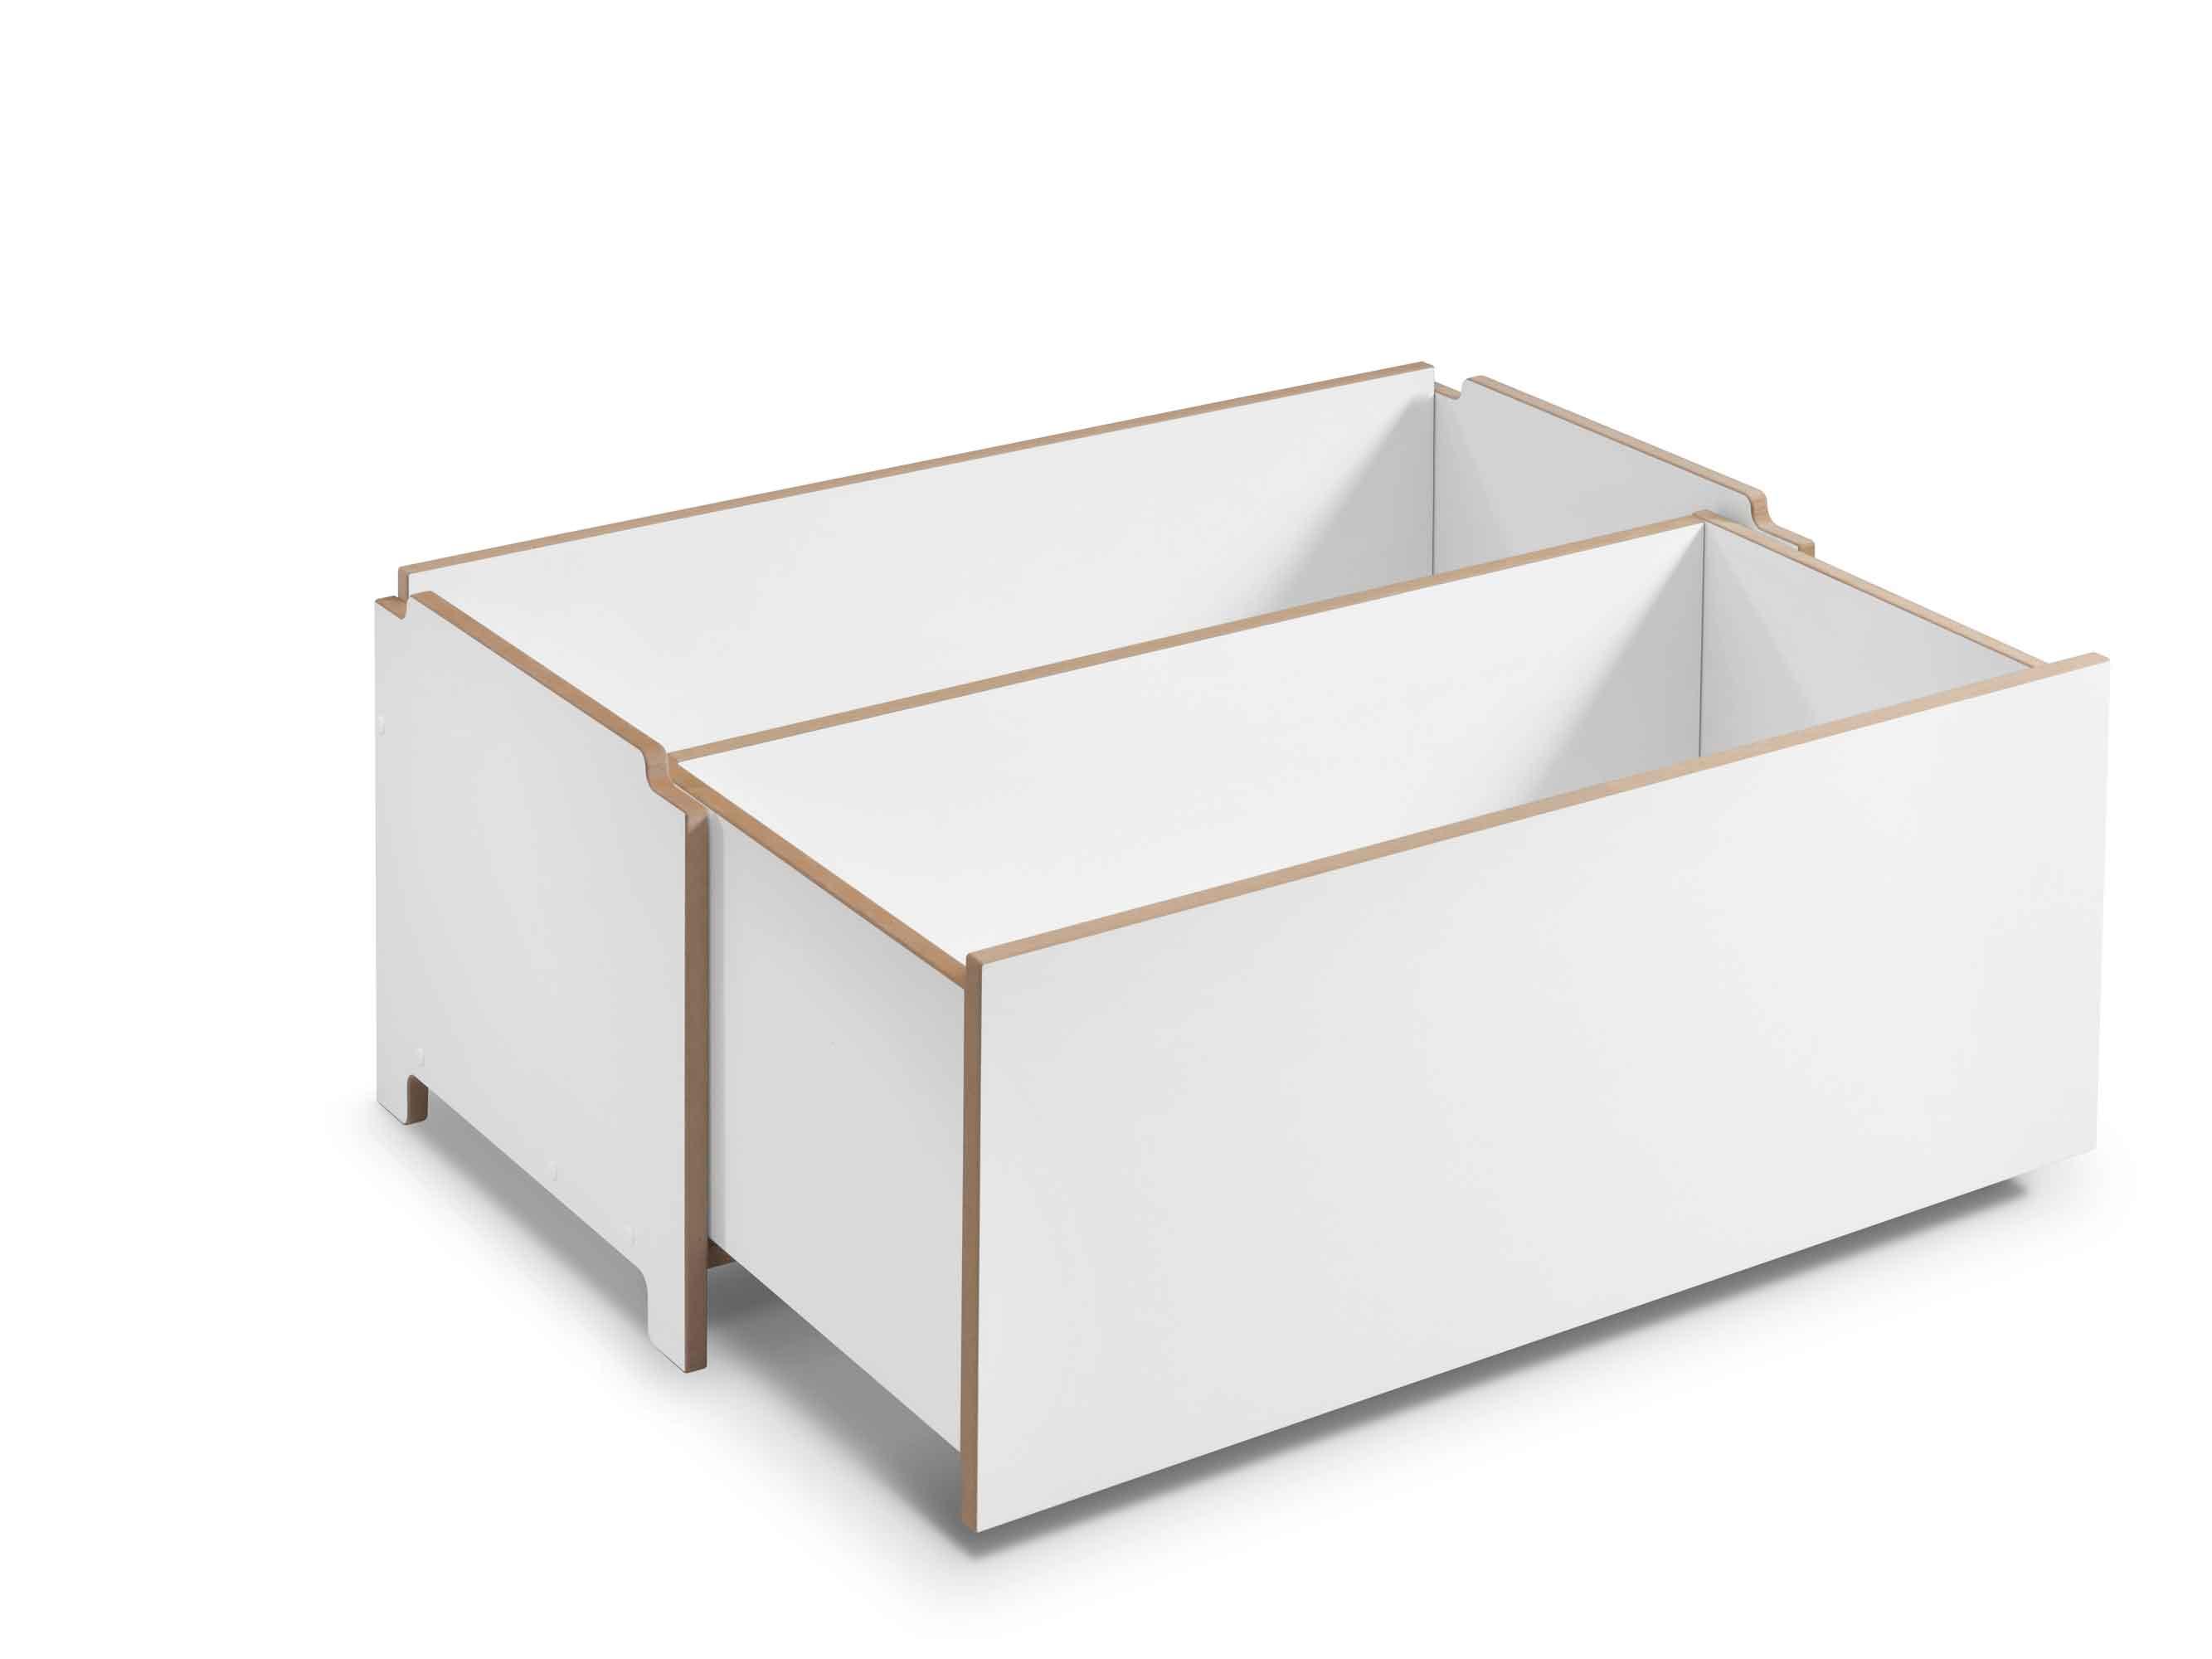 harry regal mit 1 schublade 43 5cm tief country living shop. Black Bedroom Furniture Sets. Home Design Ideas